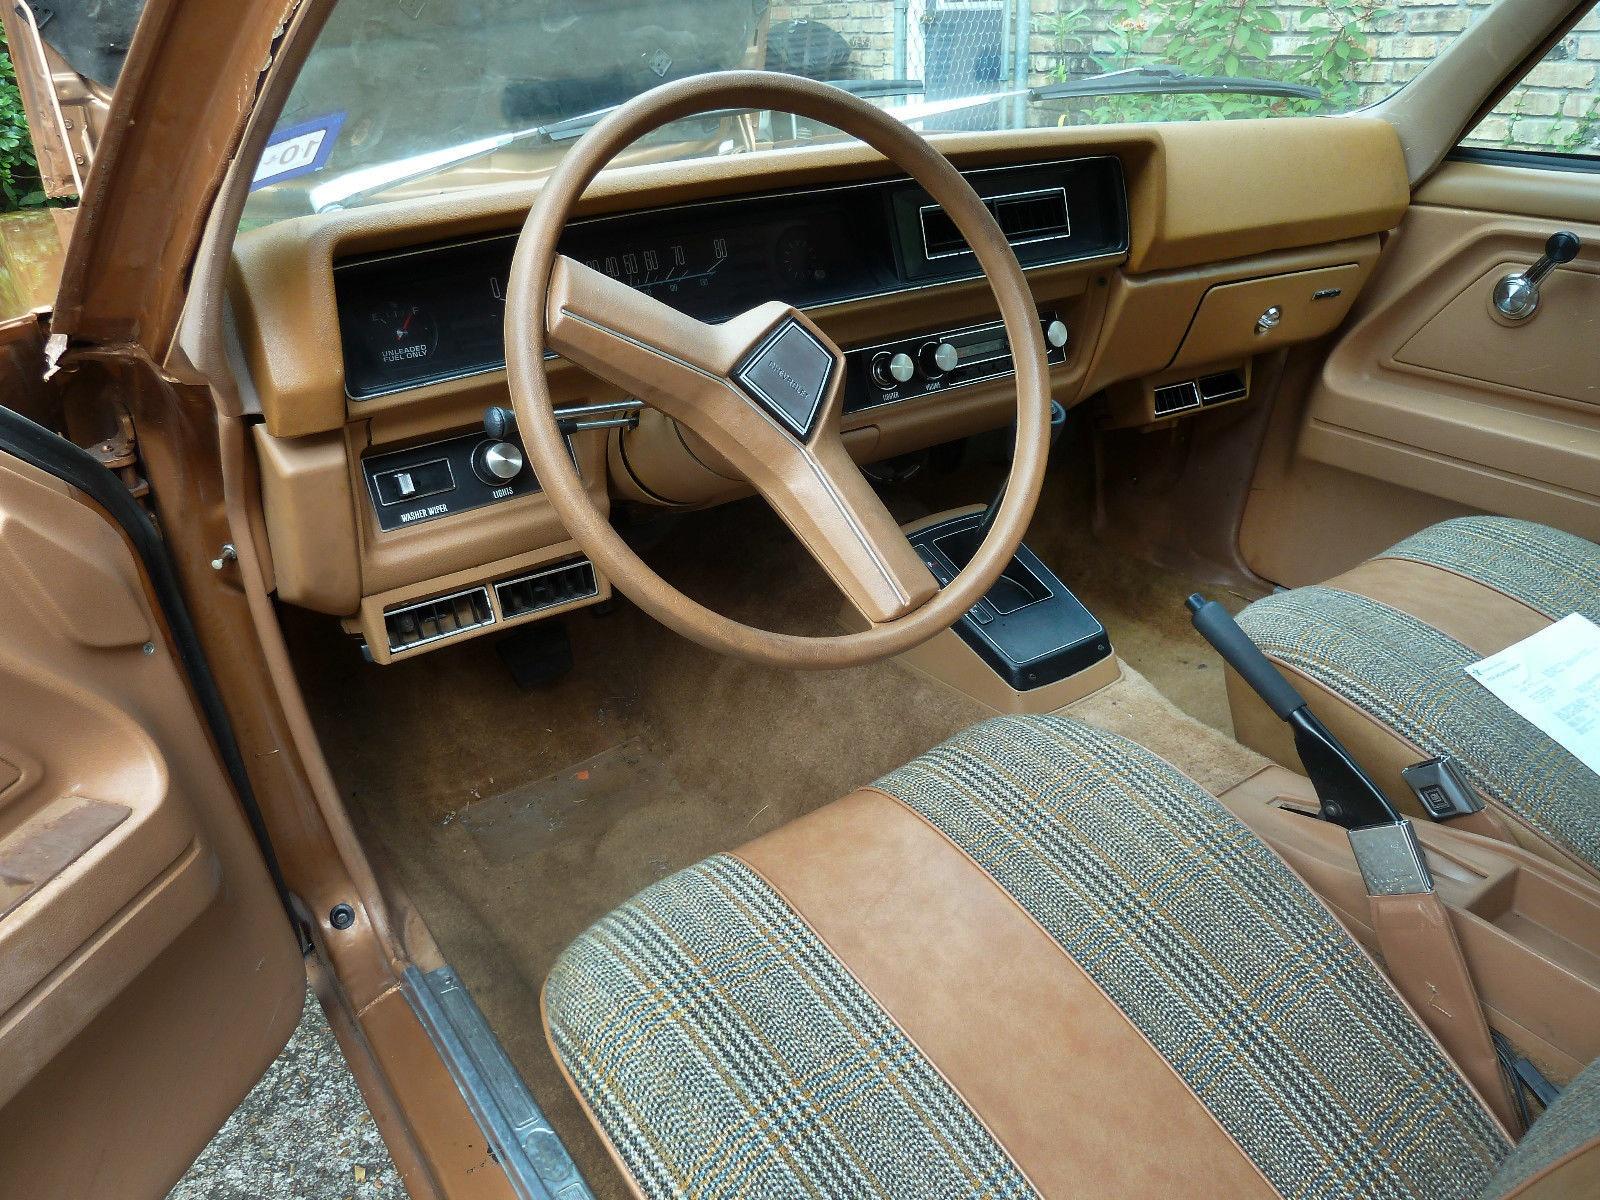 $7,500 MonzaVega: 1978 Chevrolet Monza Wagon